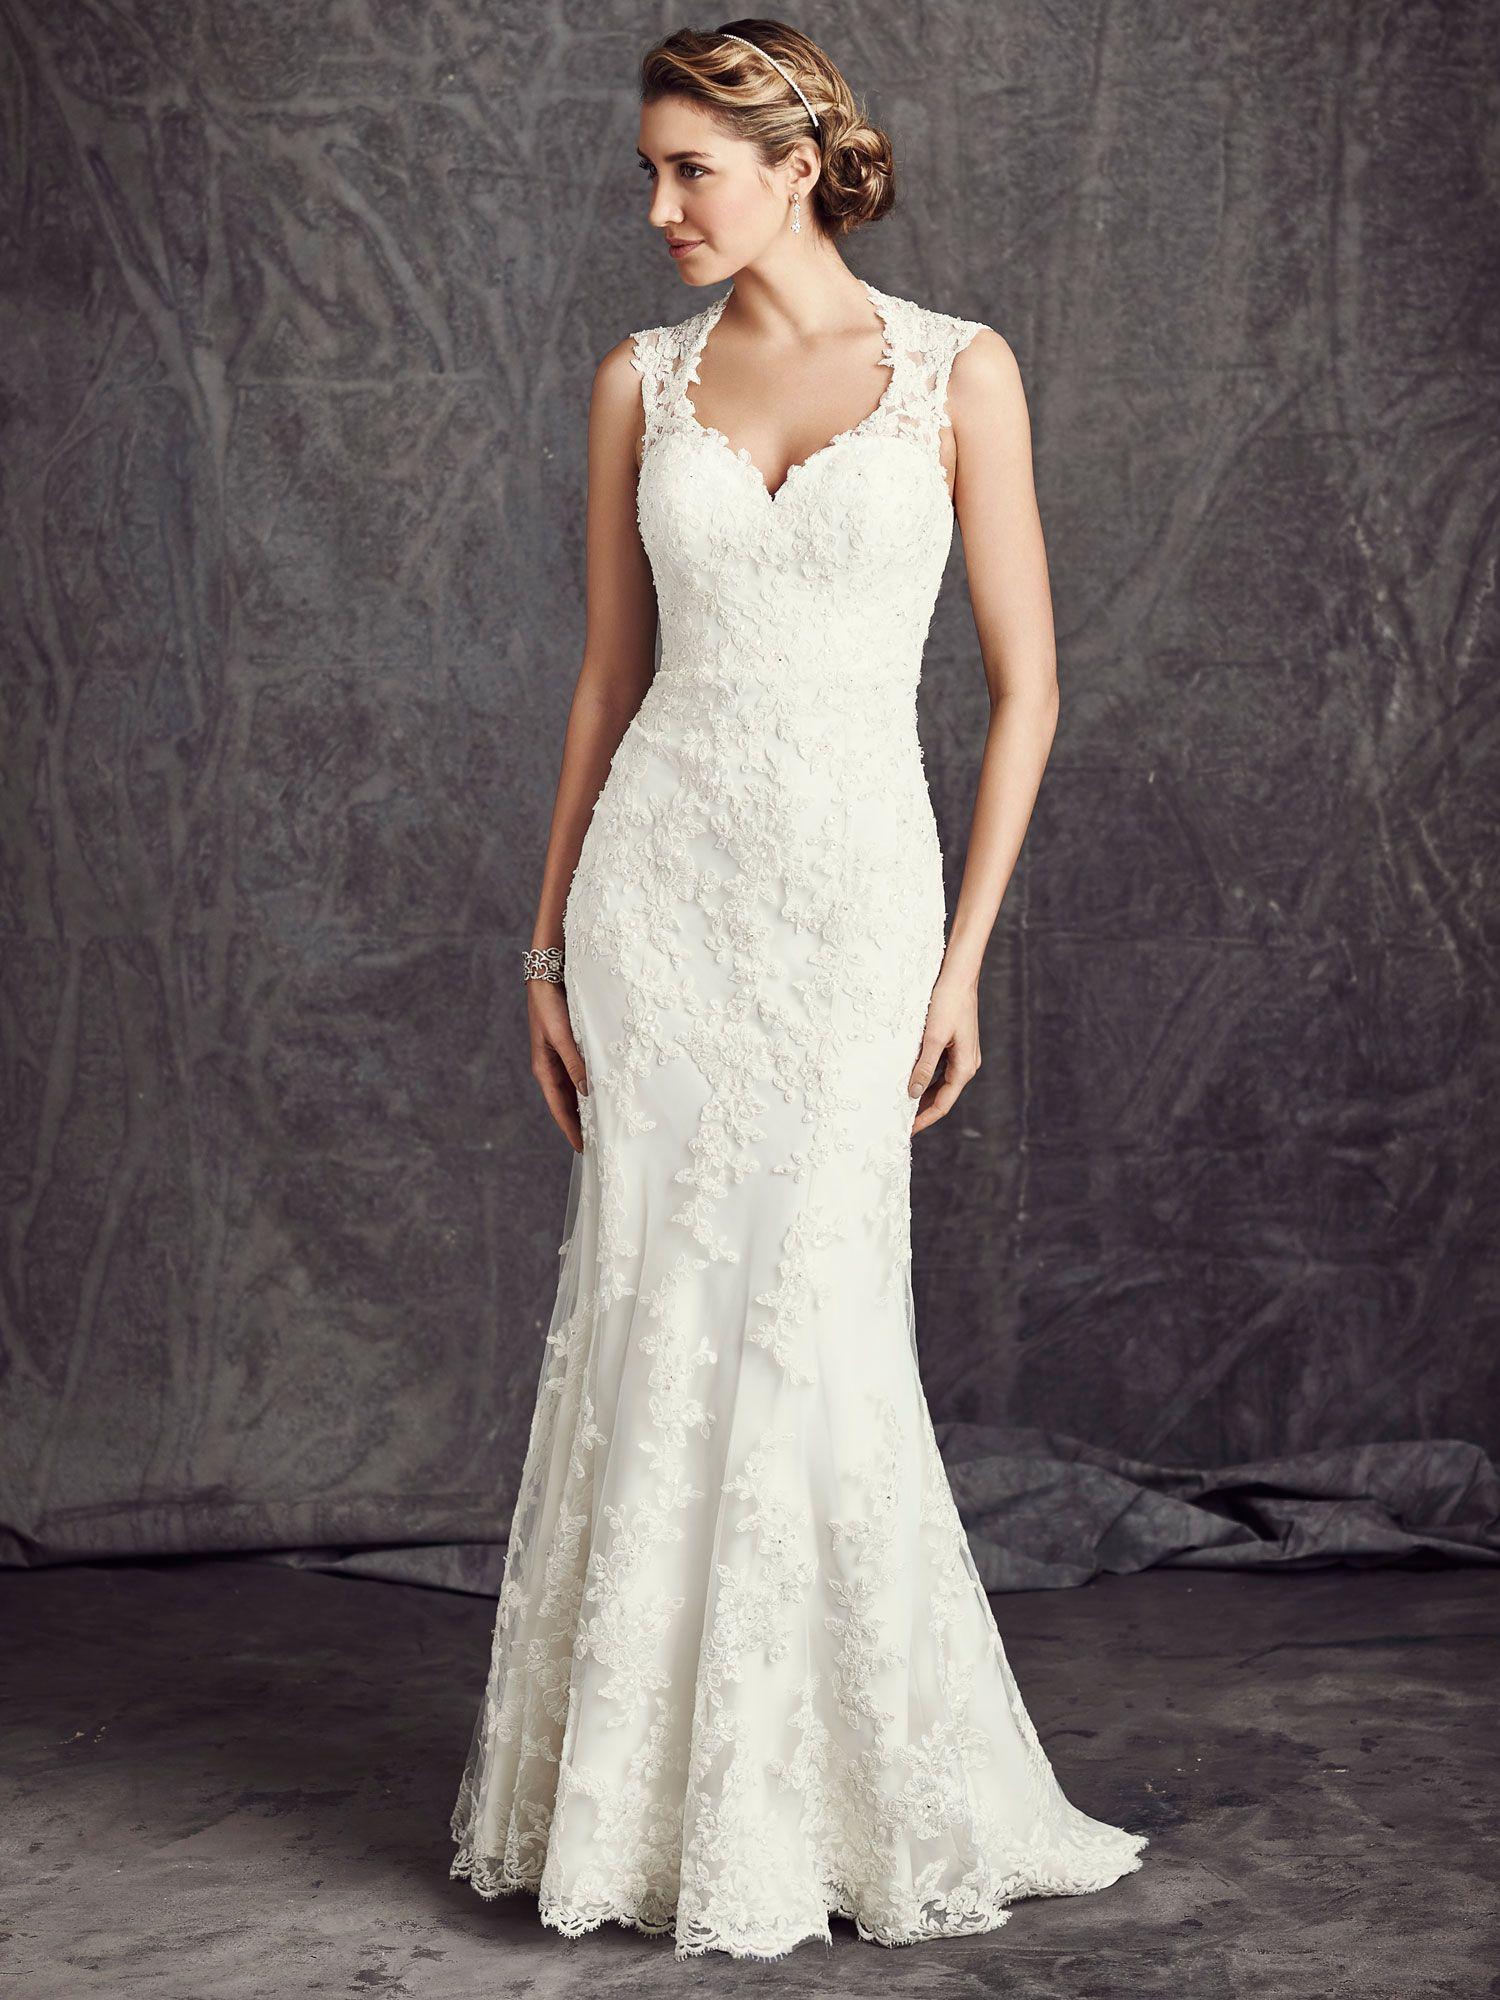 One strap wedding dress  Alexis Kay Designs Bridal  E Lincoln Hwy Dekalb IL Ella Rosa